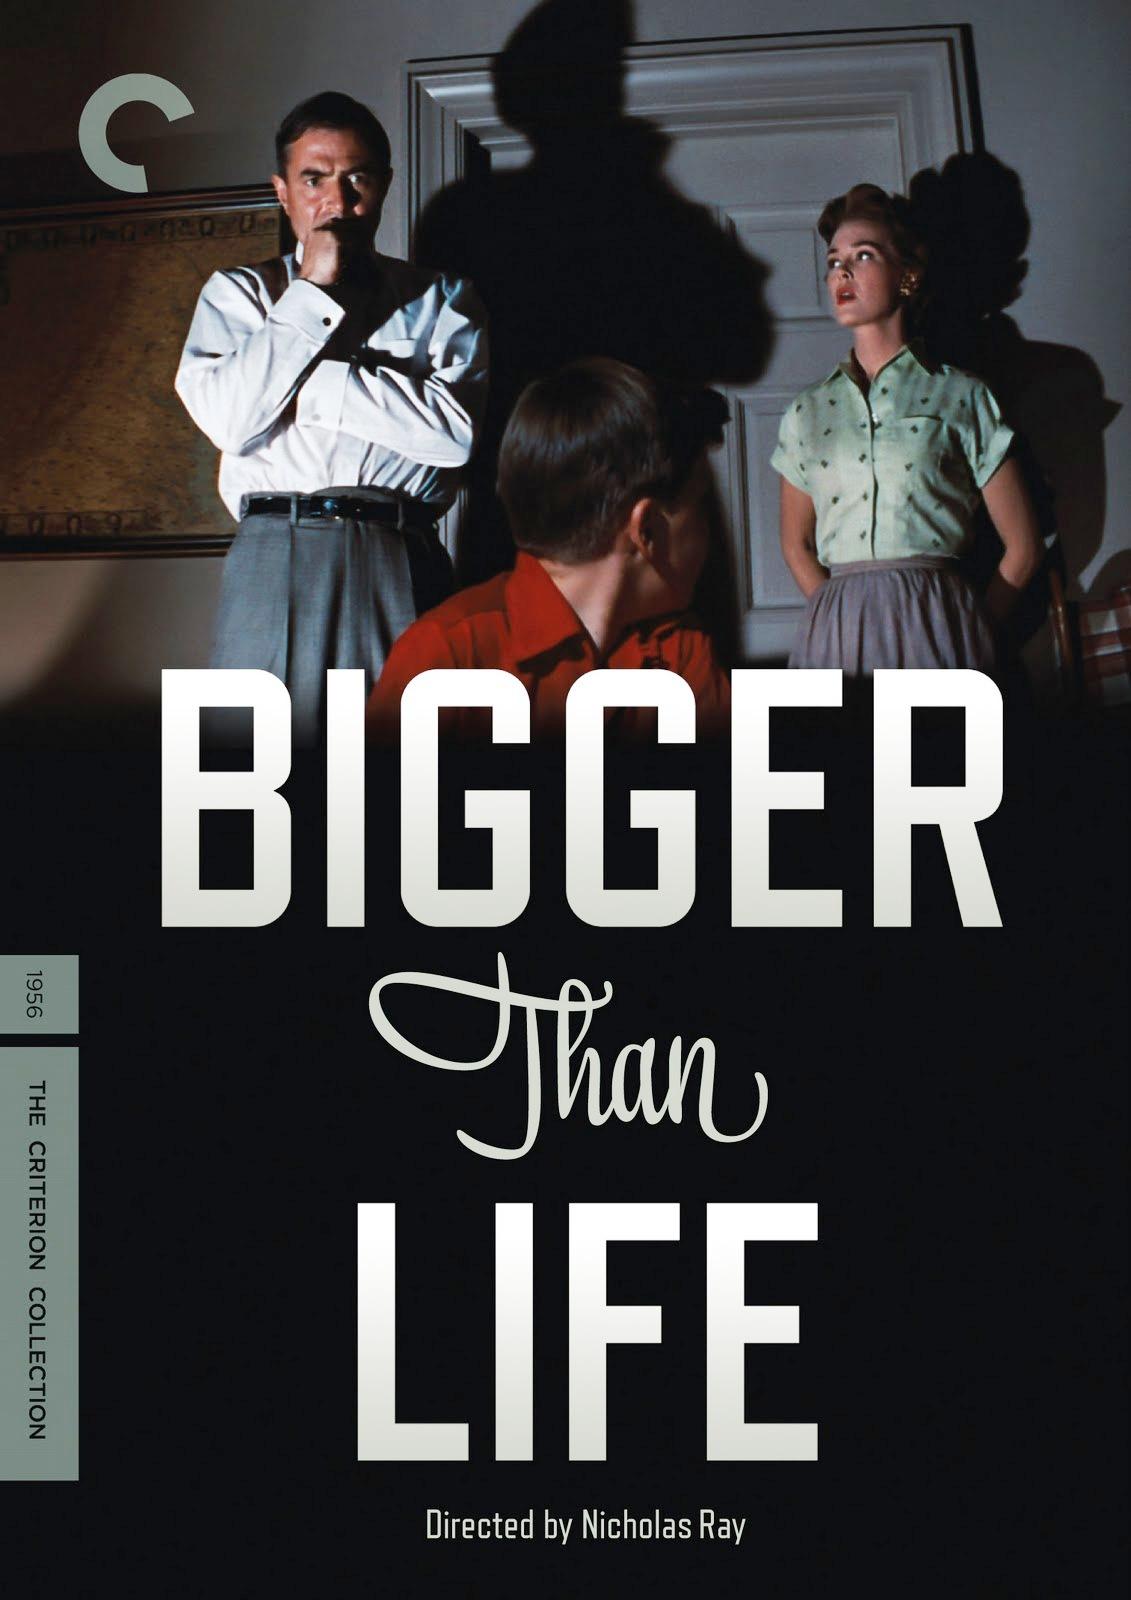 BIGGER THAN LIFE: Blu-ray (2oth Century-Fox 1956 ...